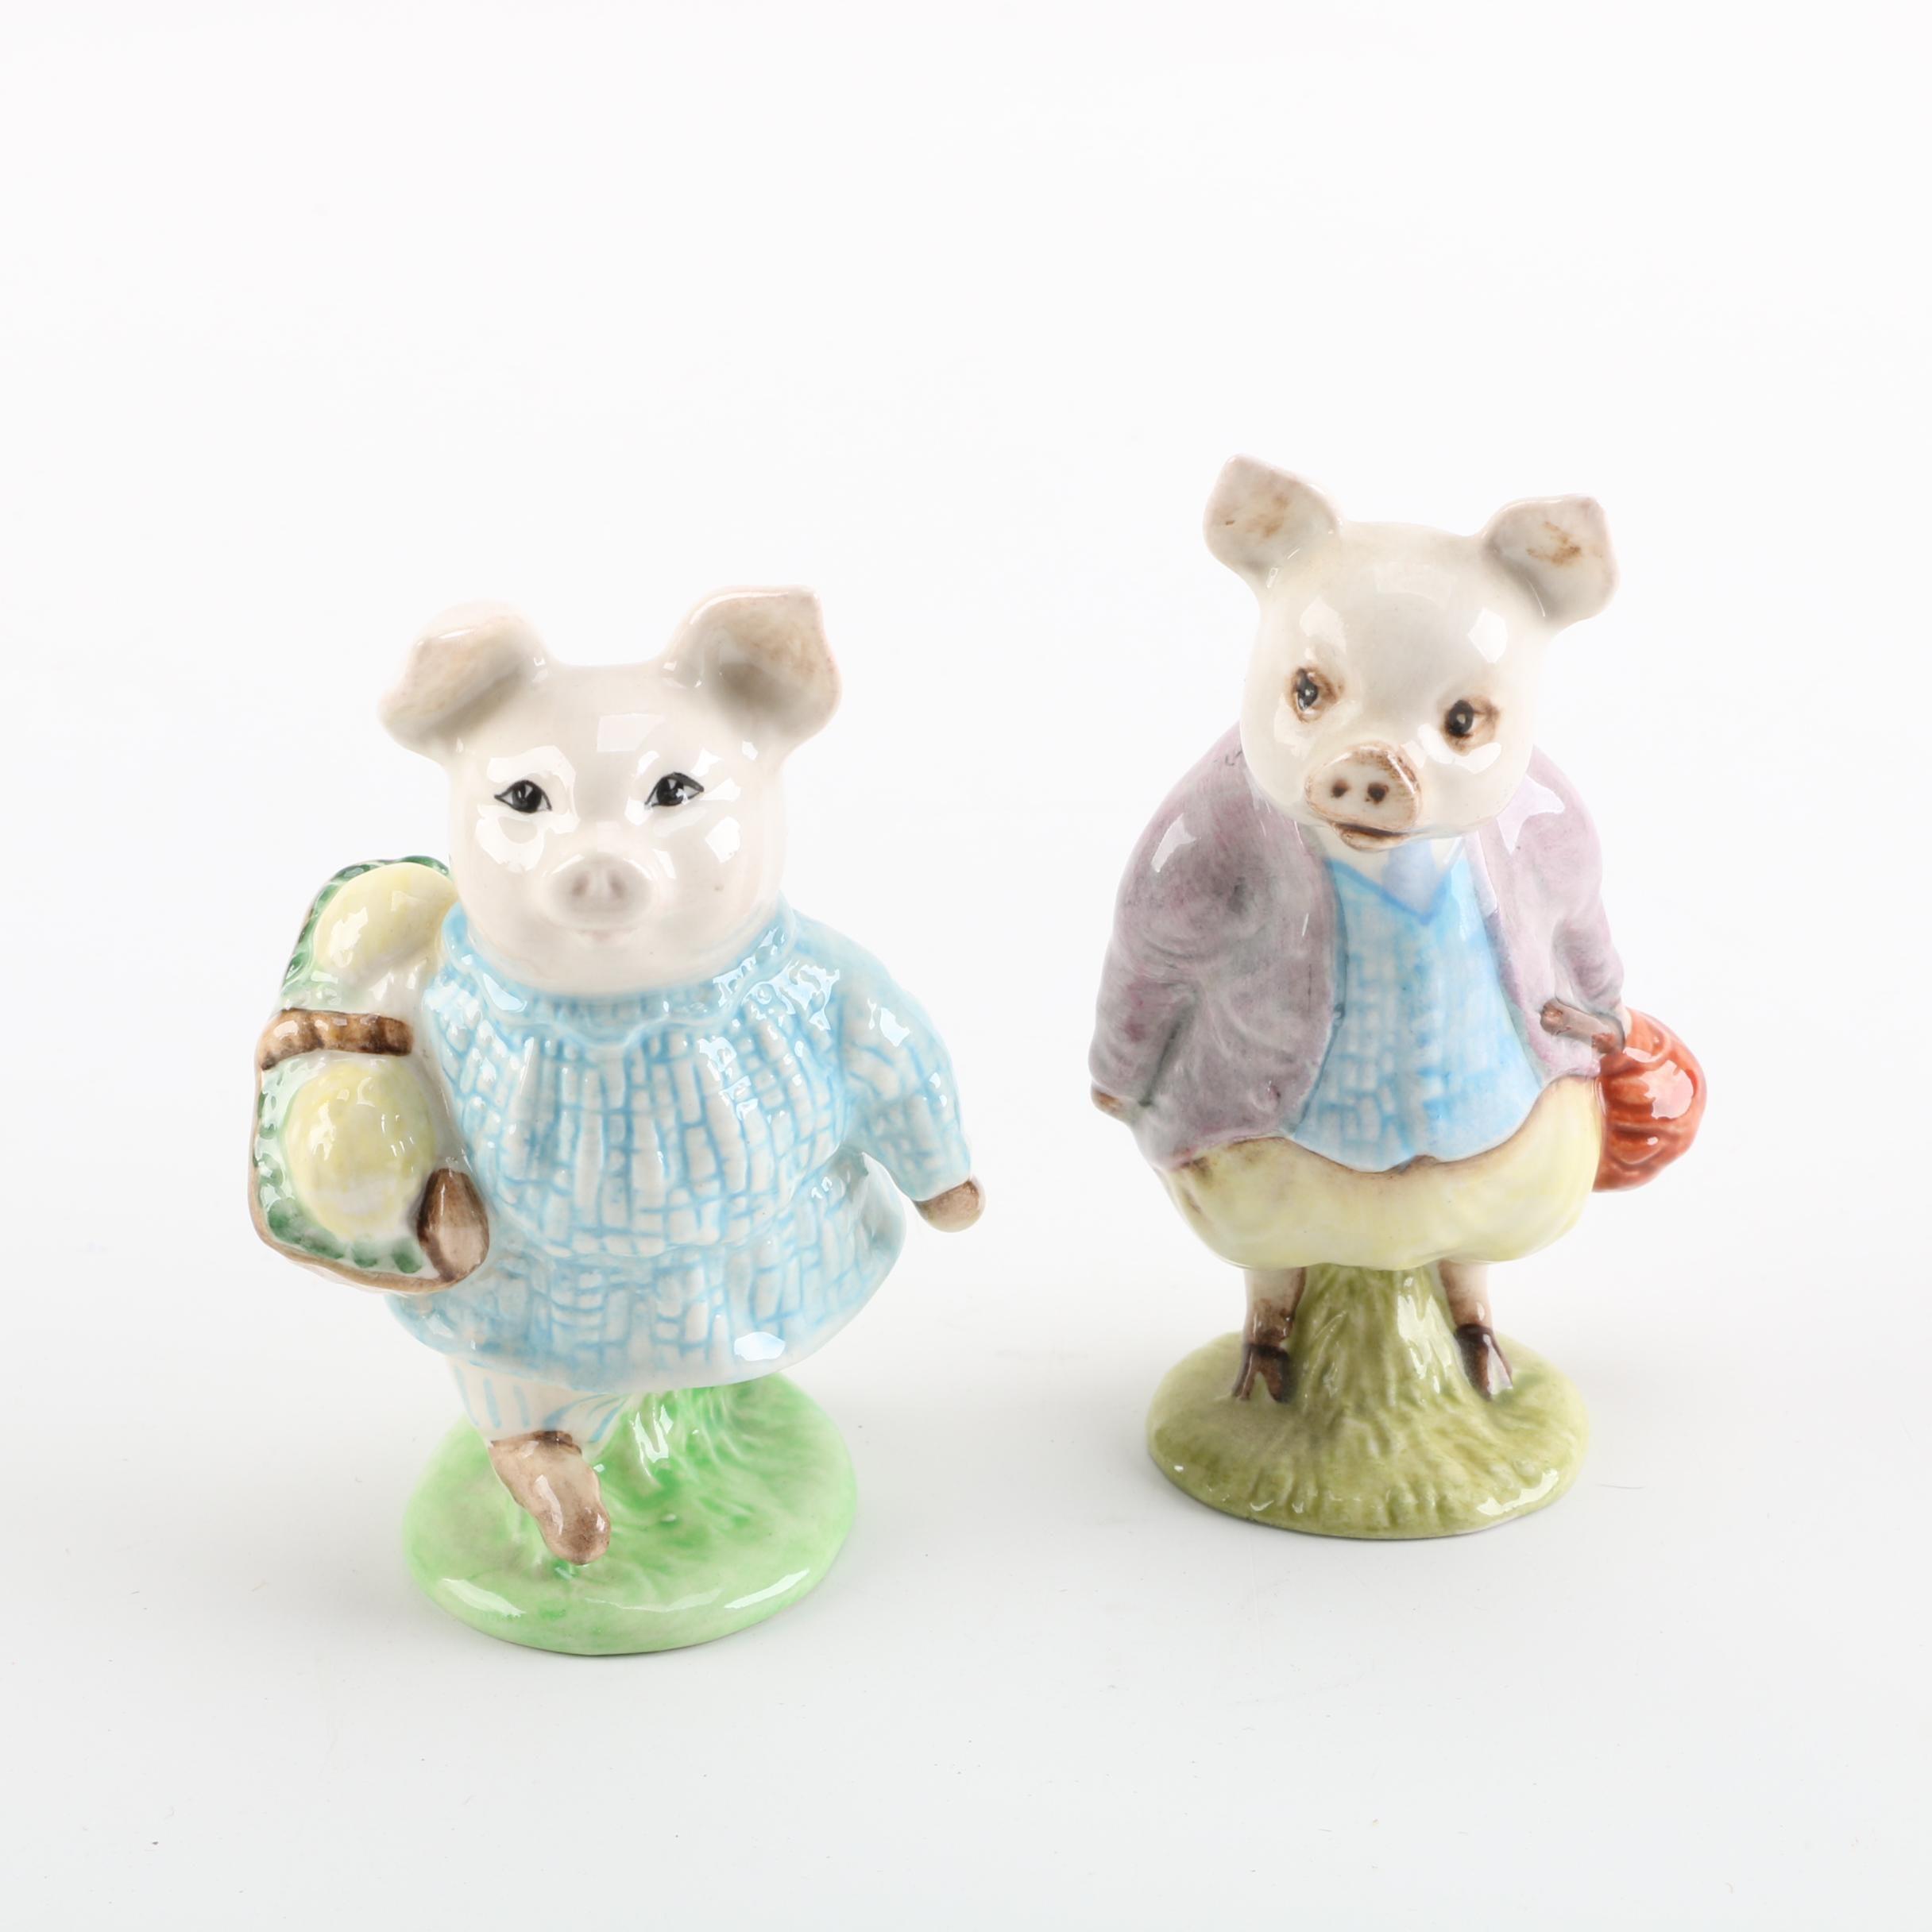 Beswick's Beatrix Potter Ceramic Pig Figurines